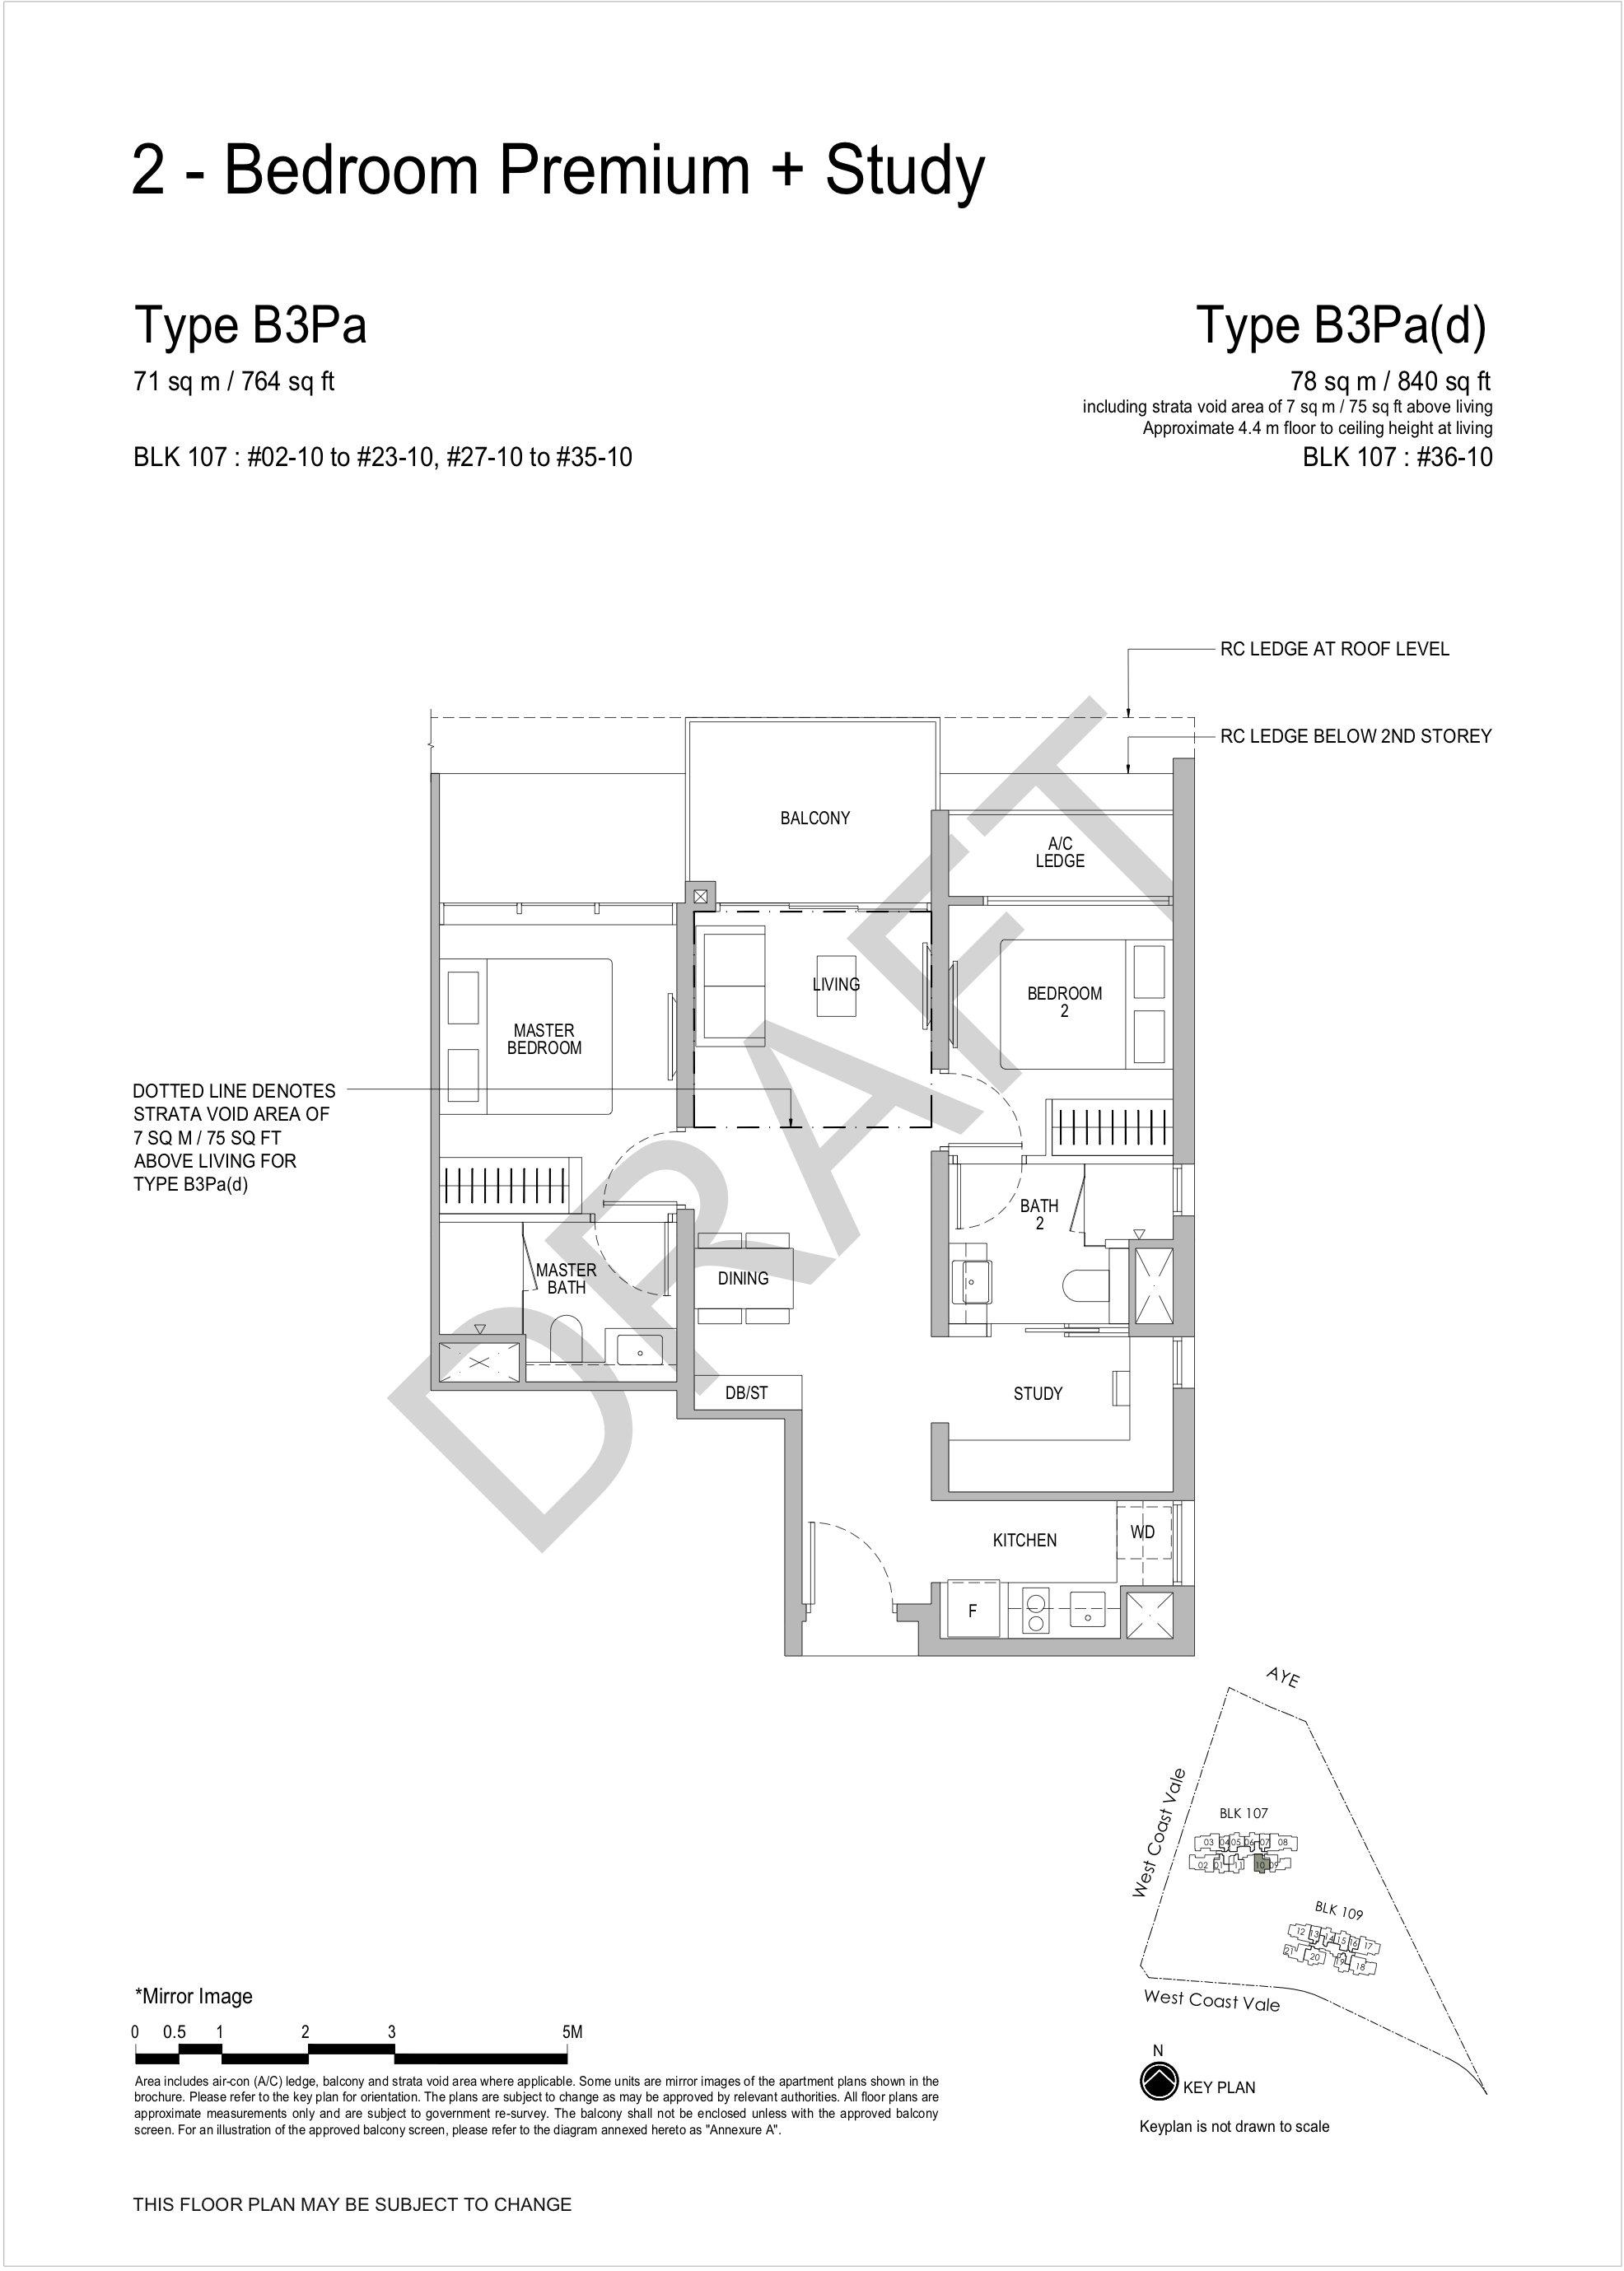 Whistler Grand 2 bedroom premium study floor plan B3Pa